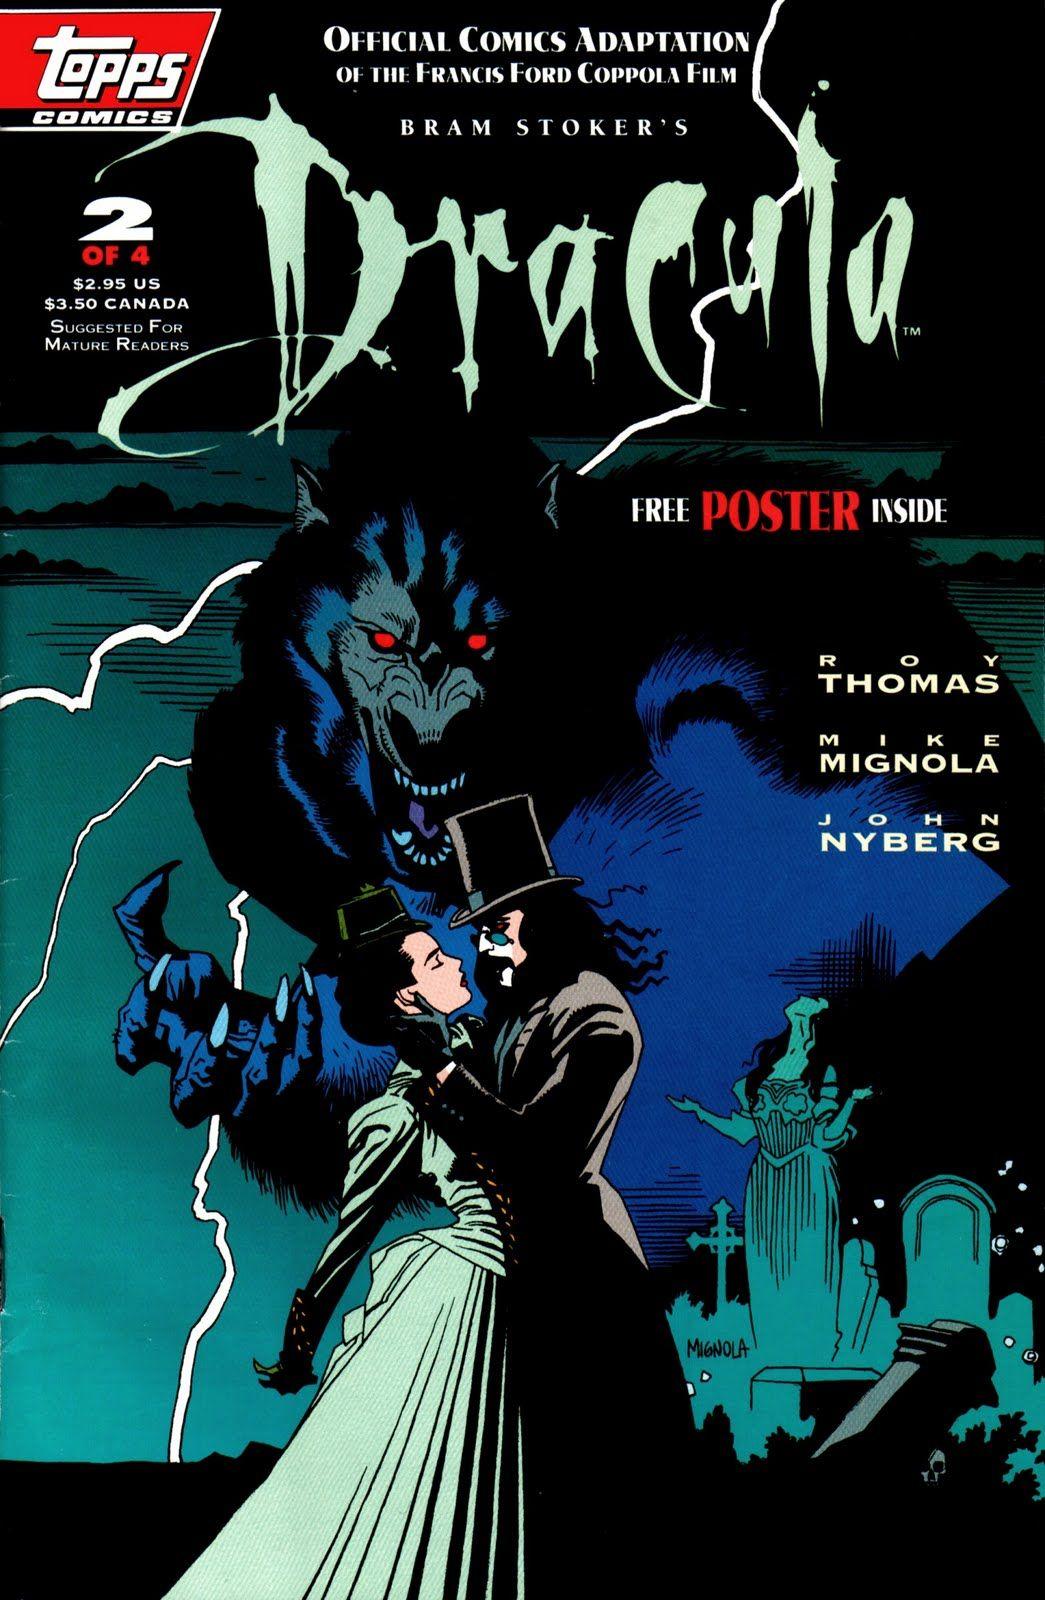 Bram Stoker's Dracula 2/4 by Mike Mignola